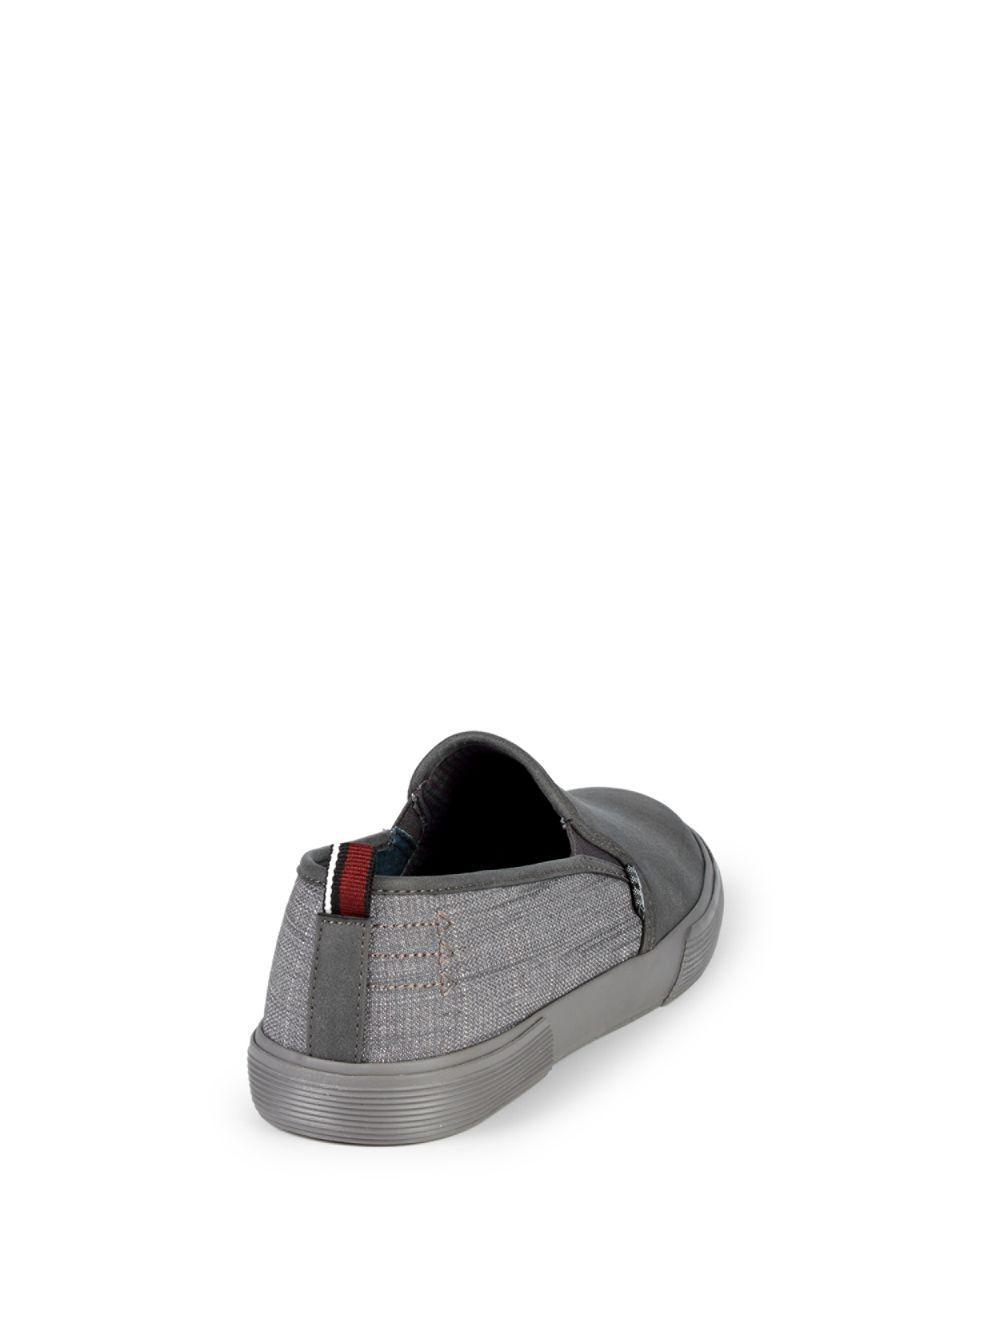 c700323bd57d4 Lyst - Ben Sherman Bristol Slip-on Sneakers in Gray for Men